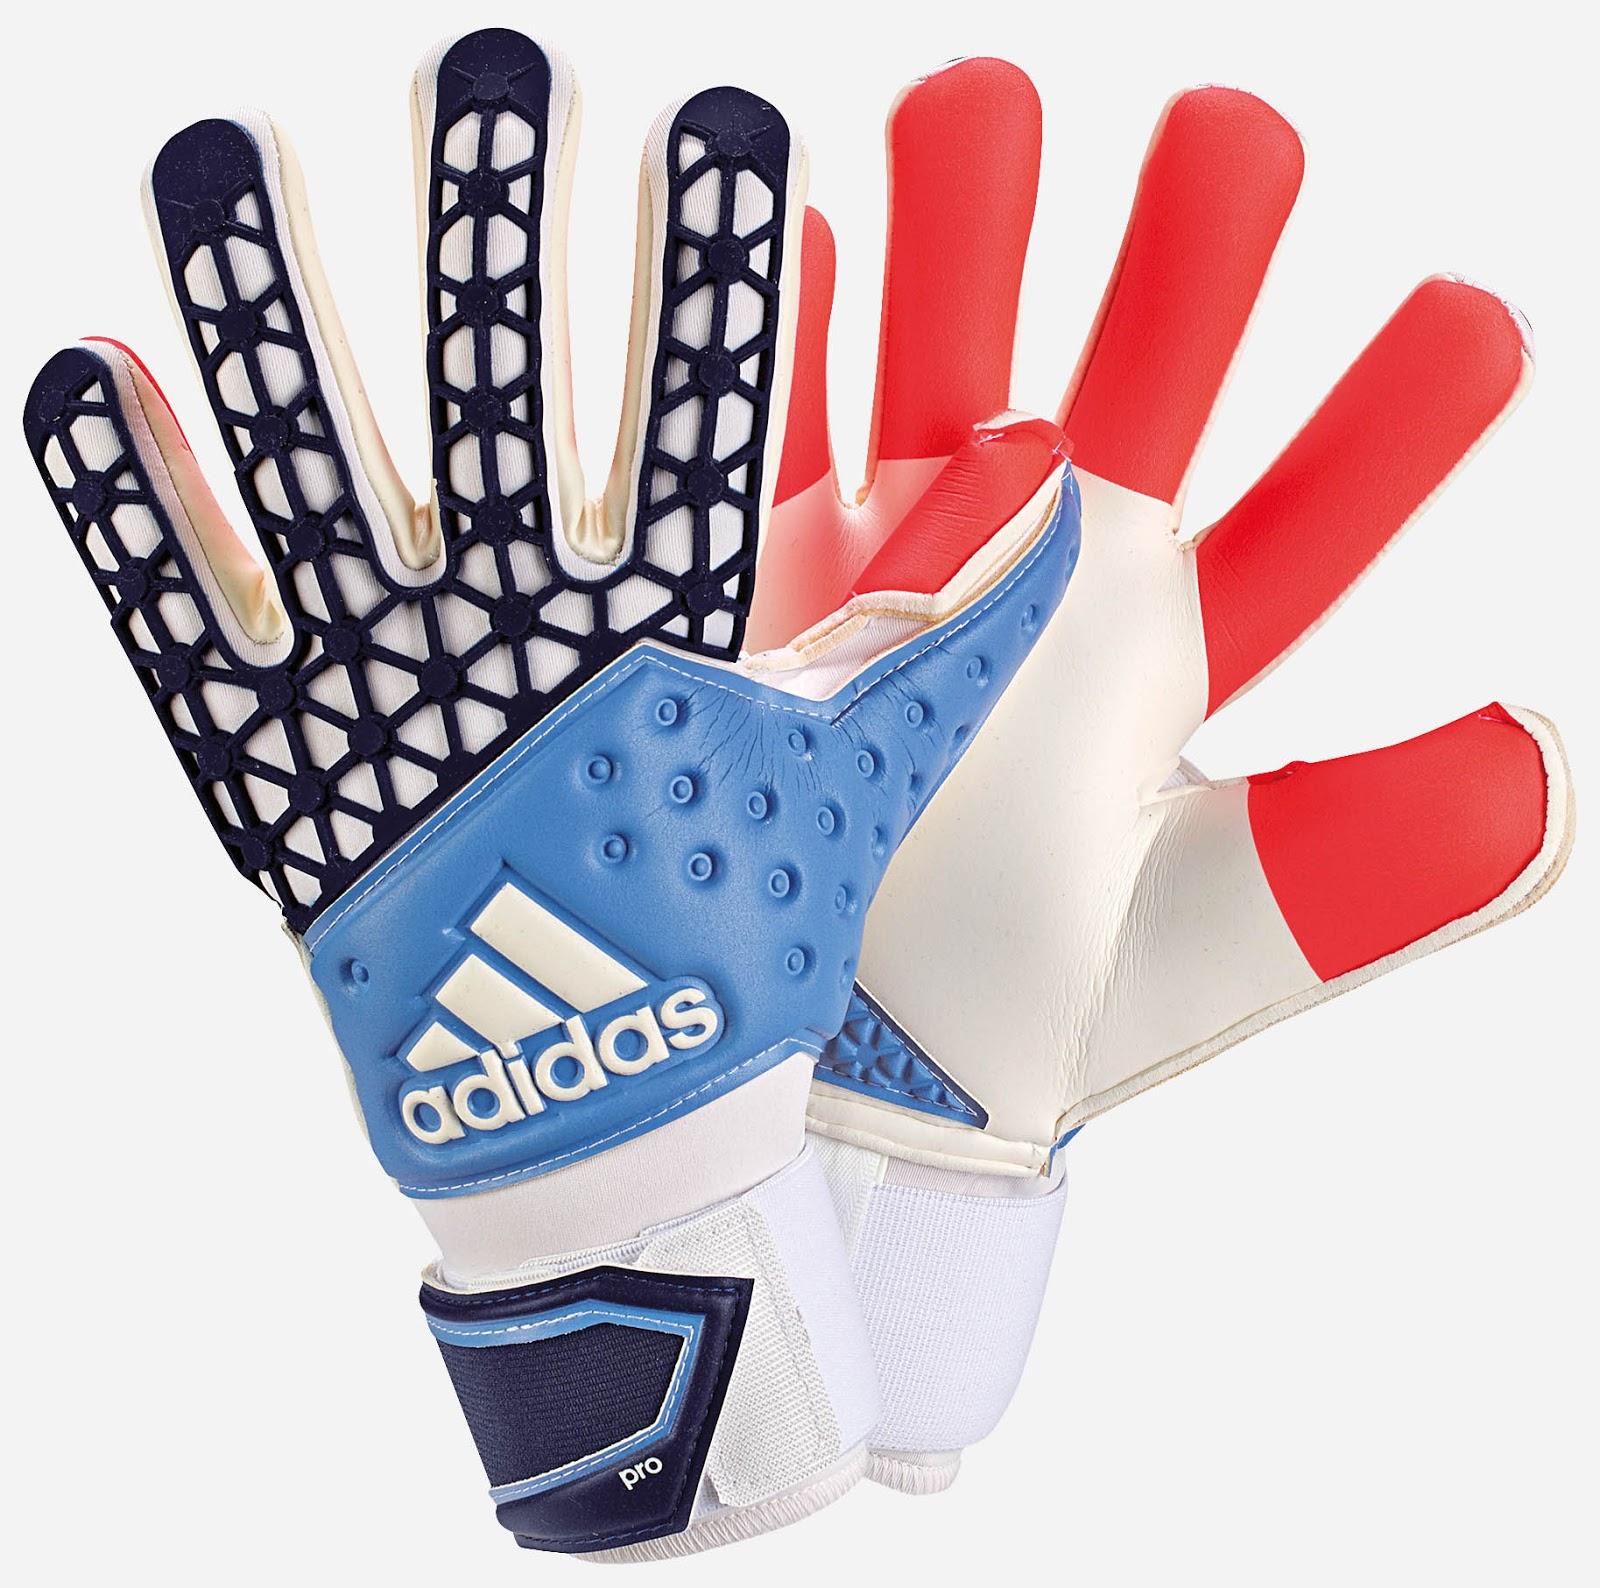 adidas gloves 2016